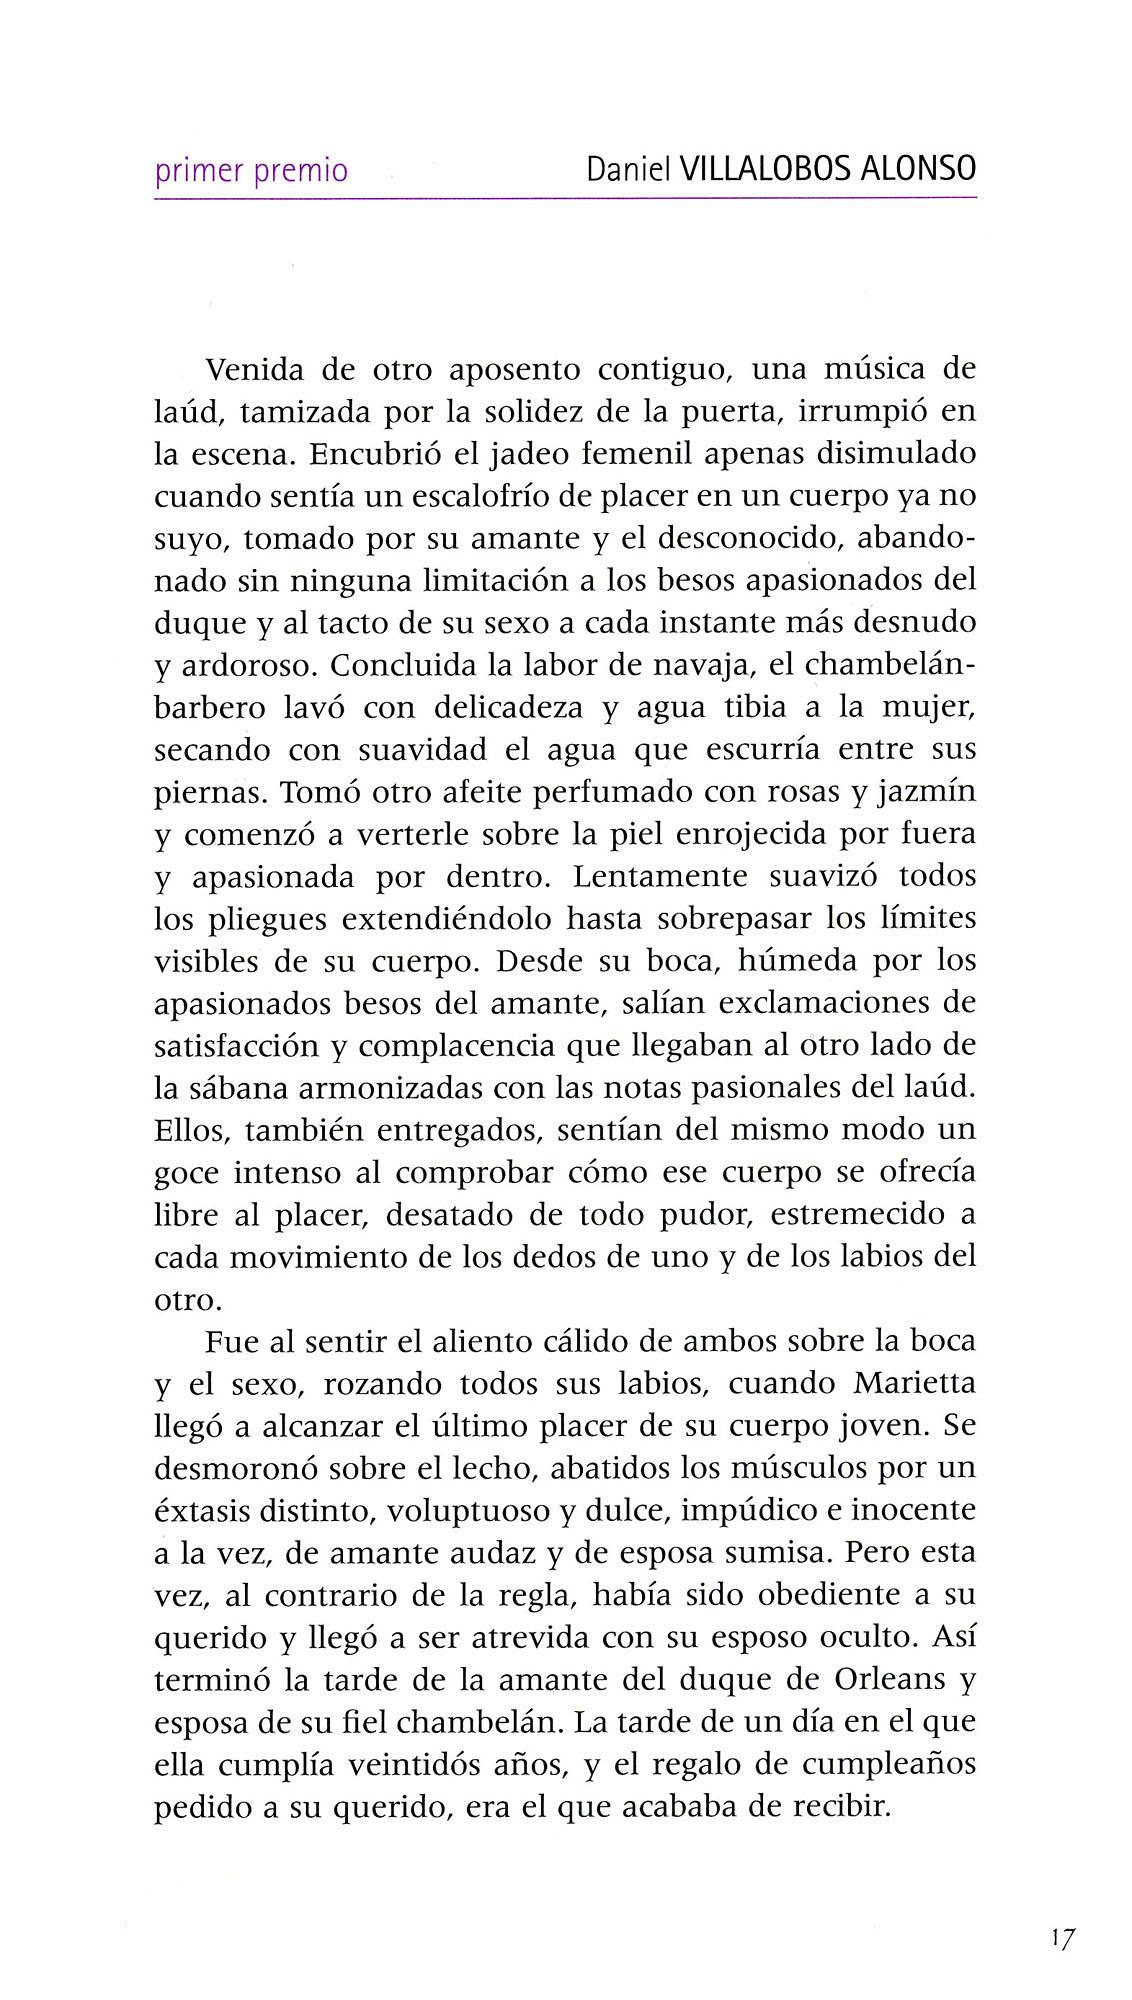 danielvillalobos-calderonsamaniego-story-storyerotic-spanishliterature-11